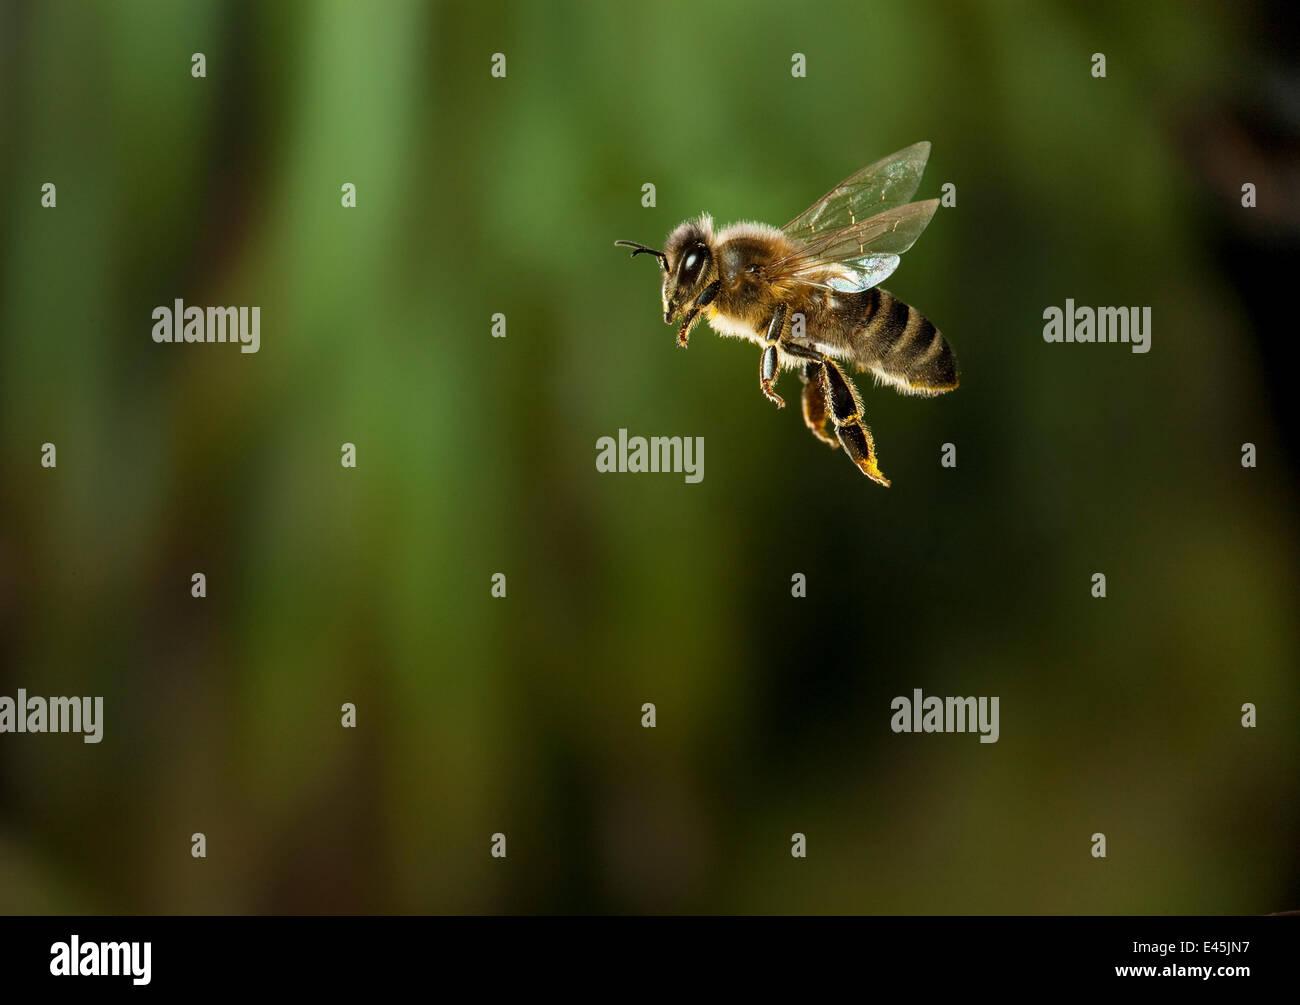 Honeybee (Apis mellifera) in flight, UK - Stock Image